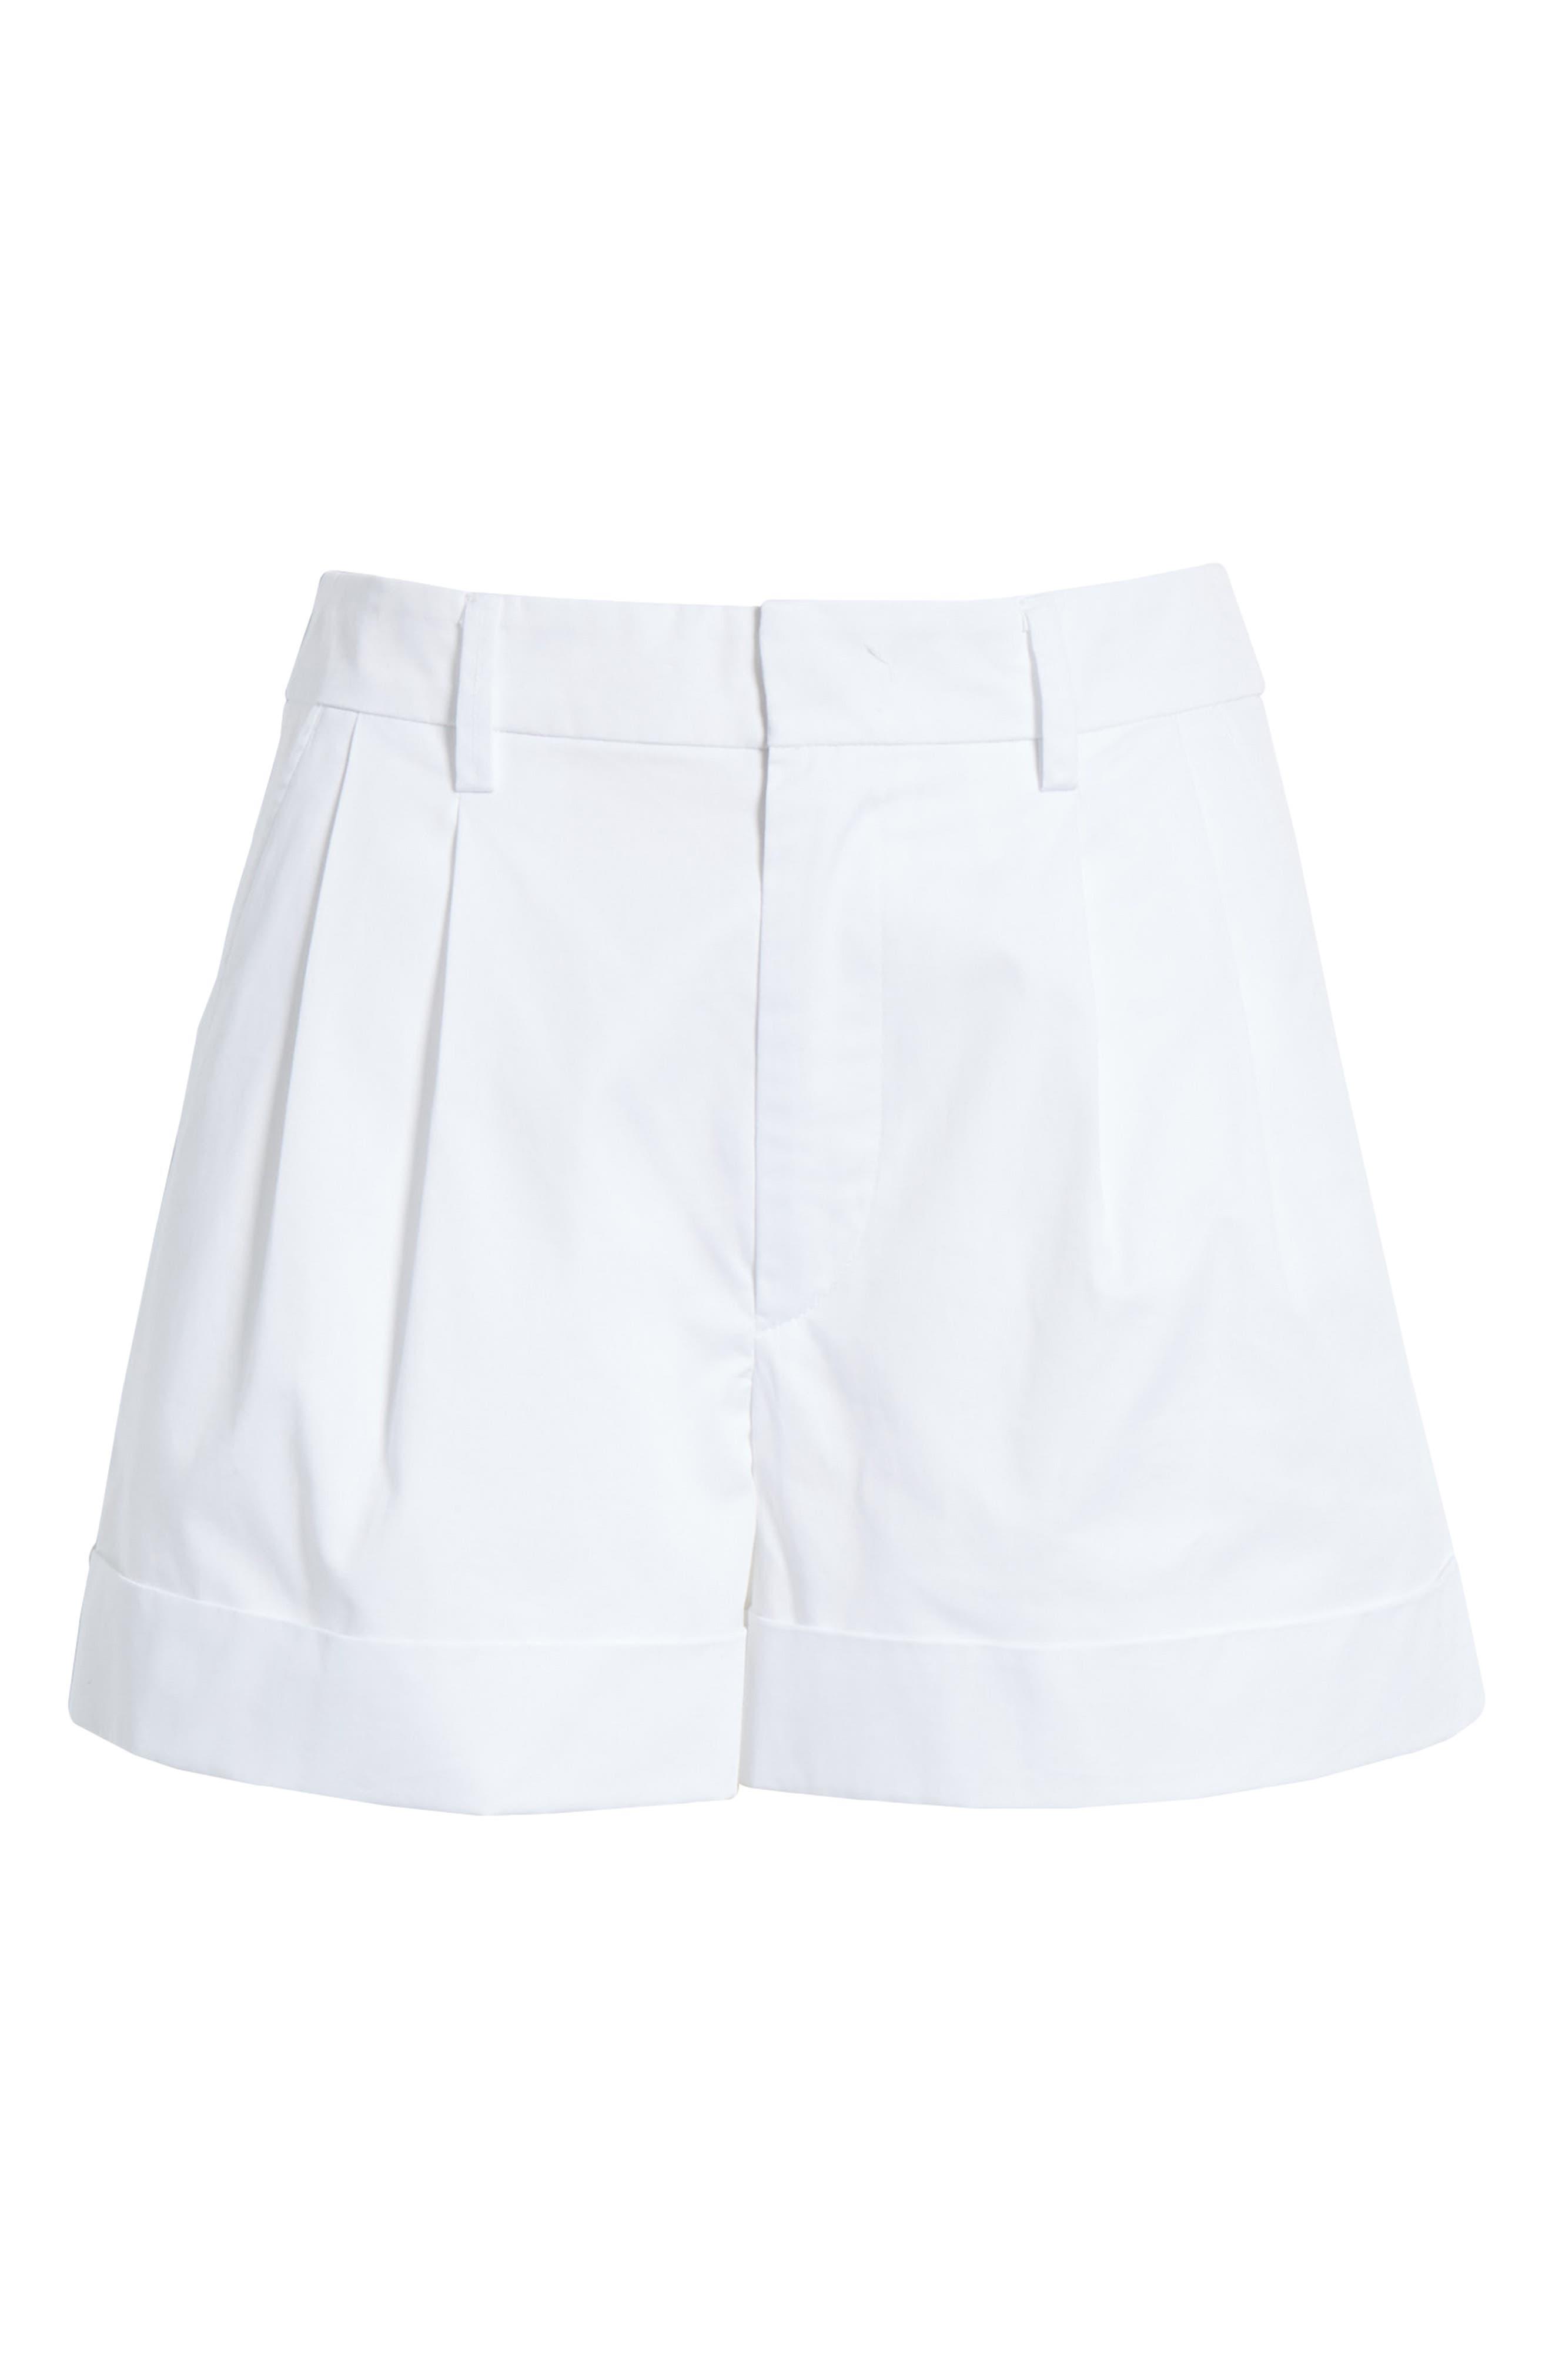 Olbia Cotton Shorts,                             Alternate thumbnail 6, color,                             WHITE